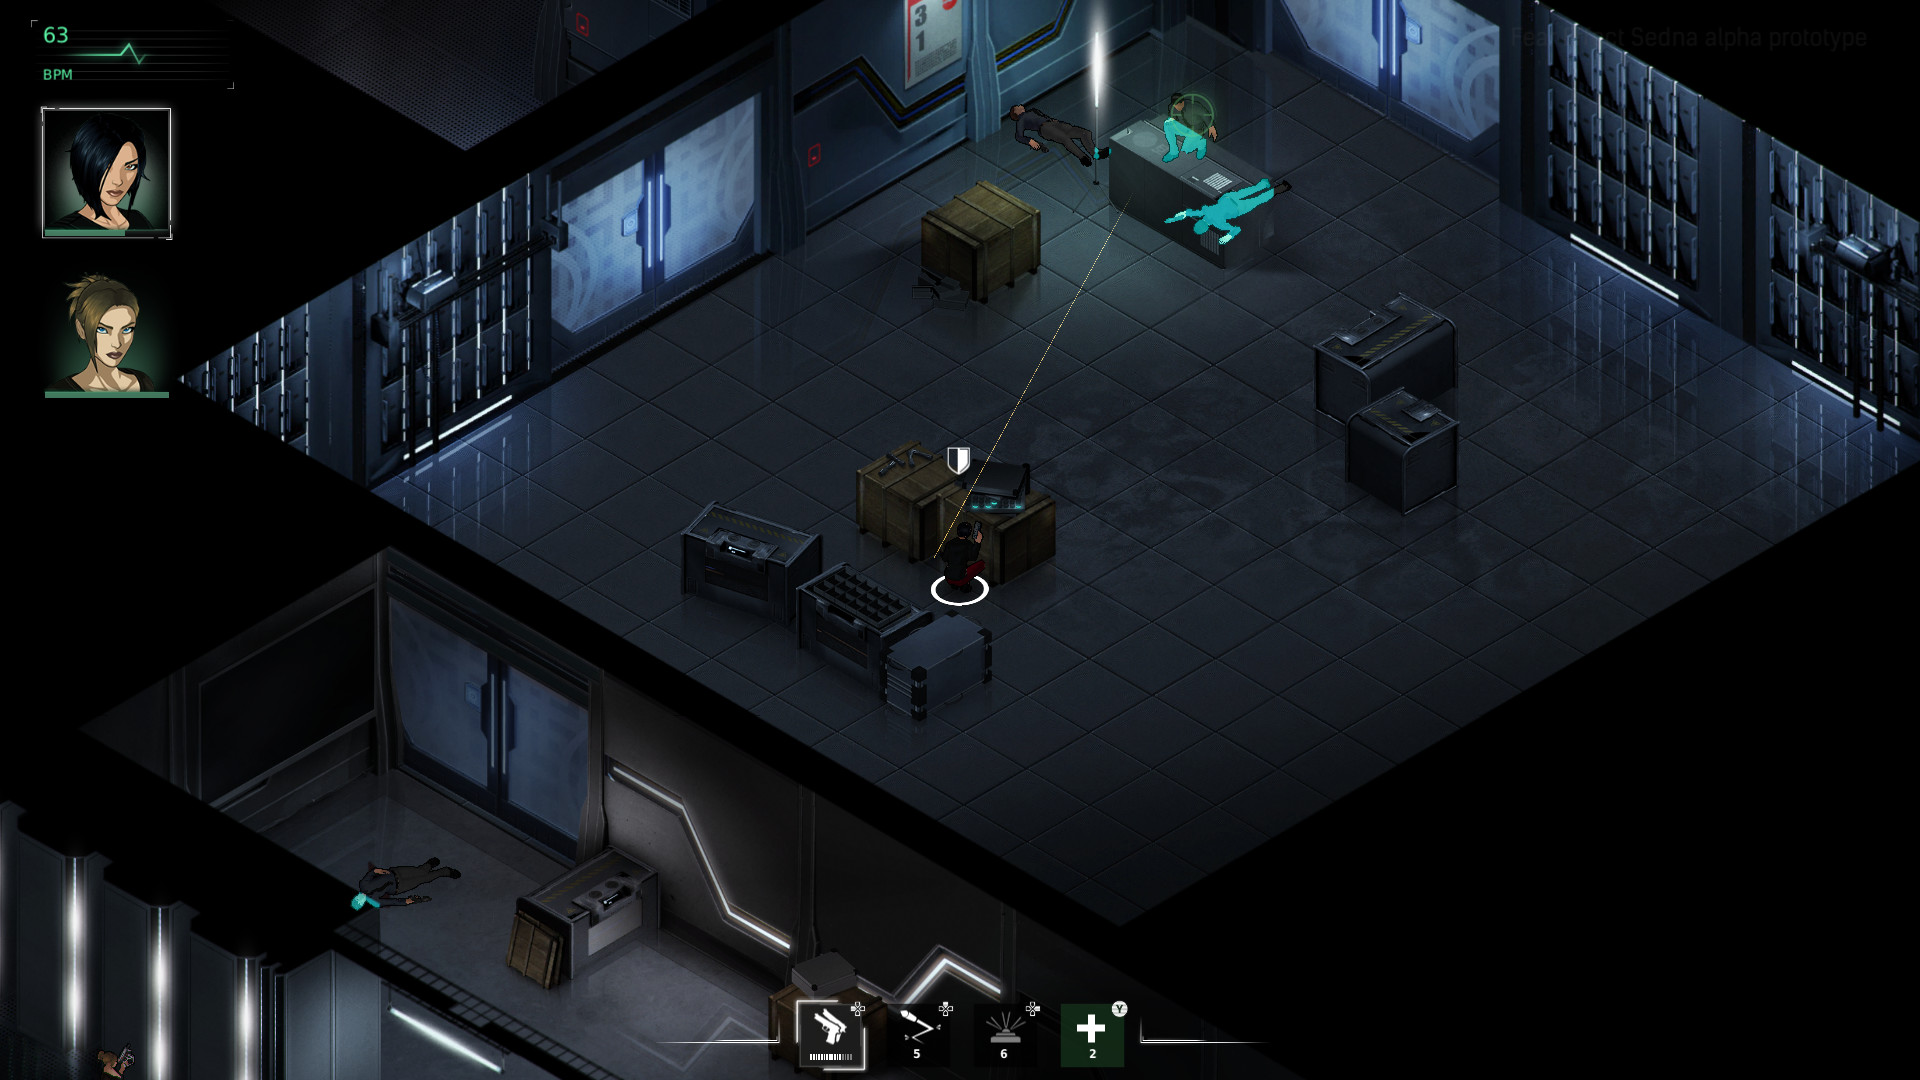 Скриншоты к Fear Effect Sedna v1.0 (GOG) полная версия на русском